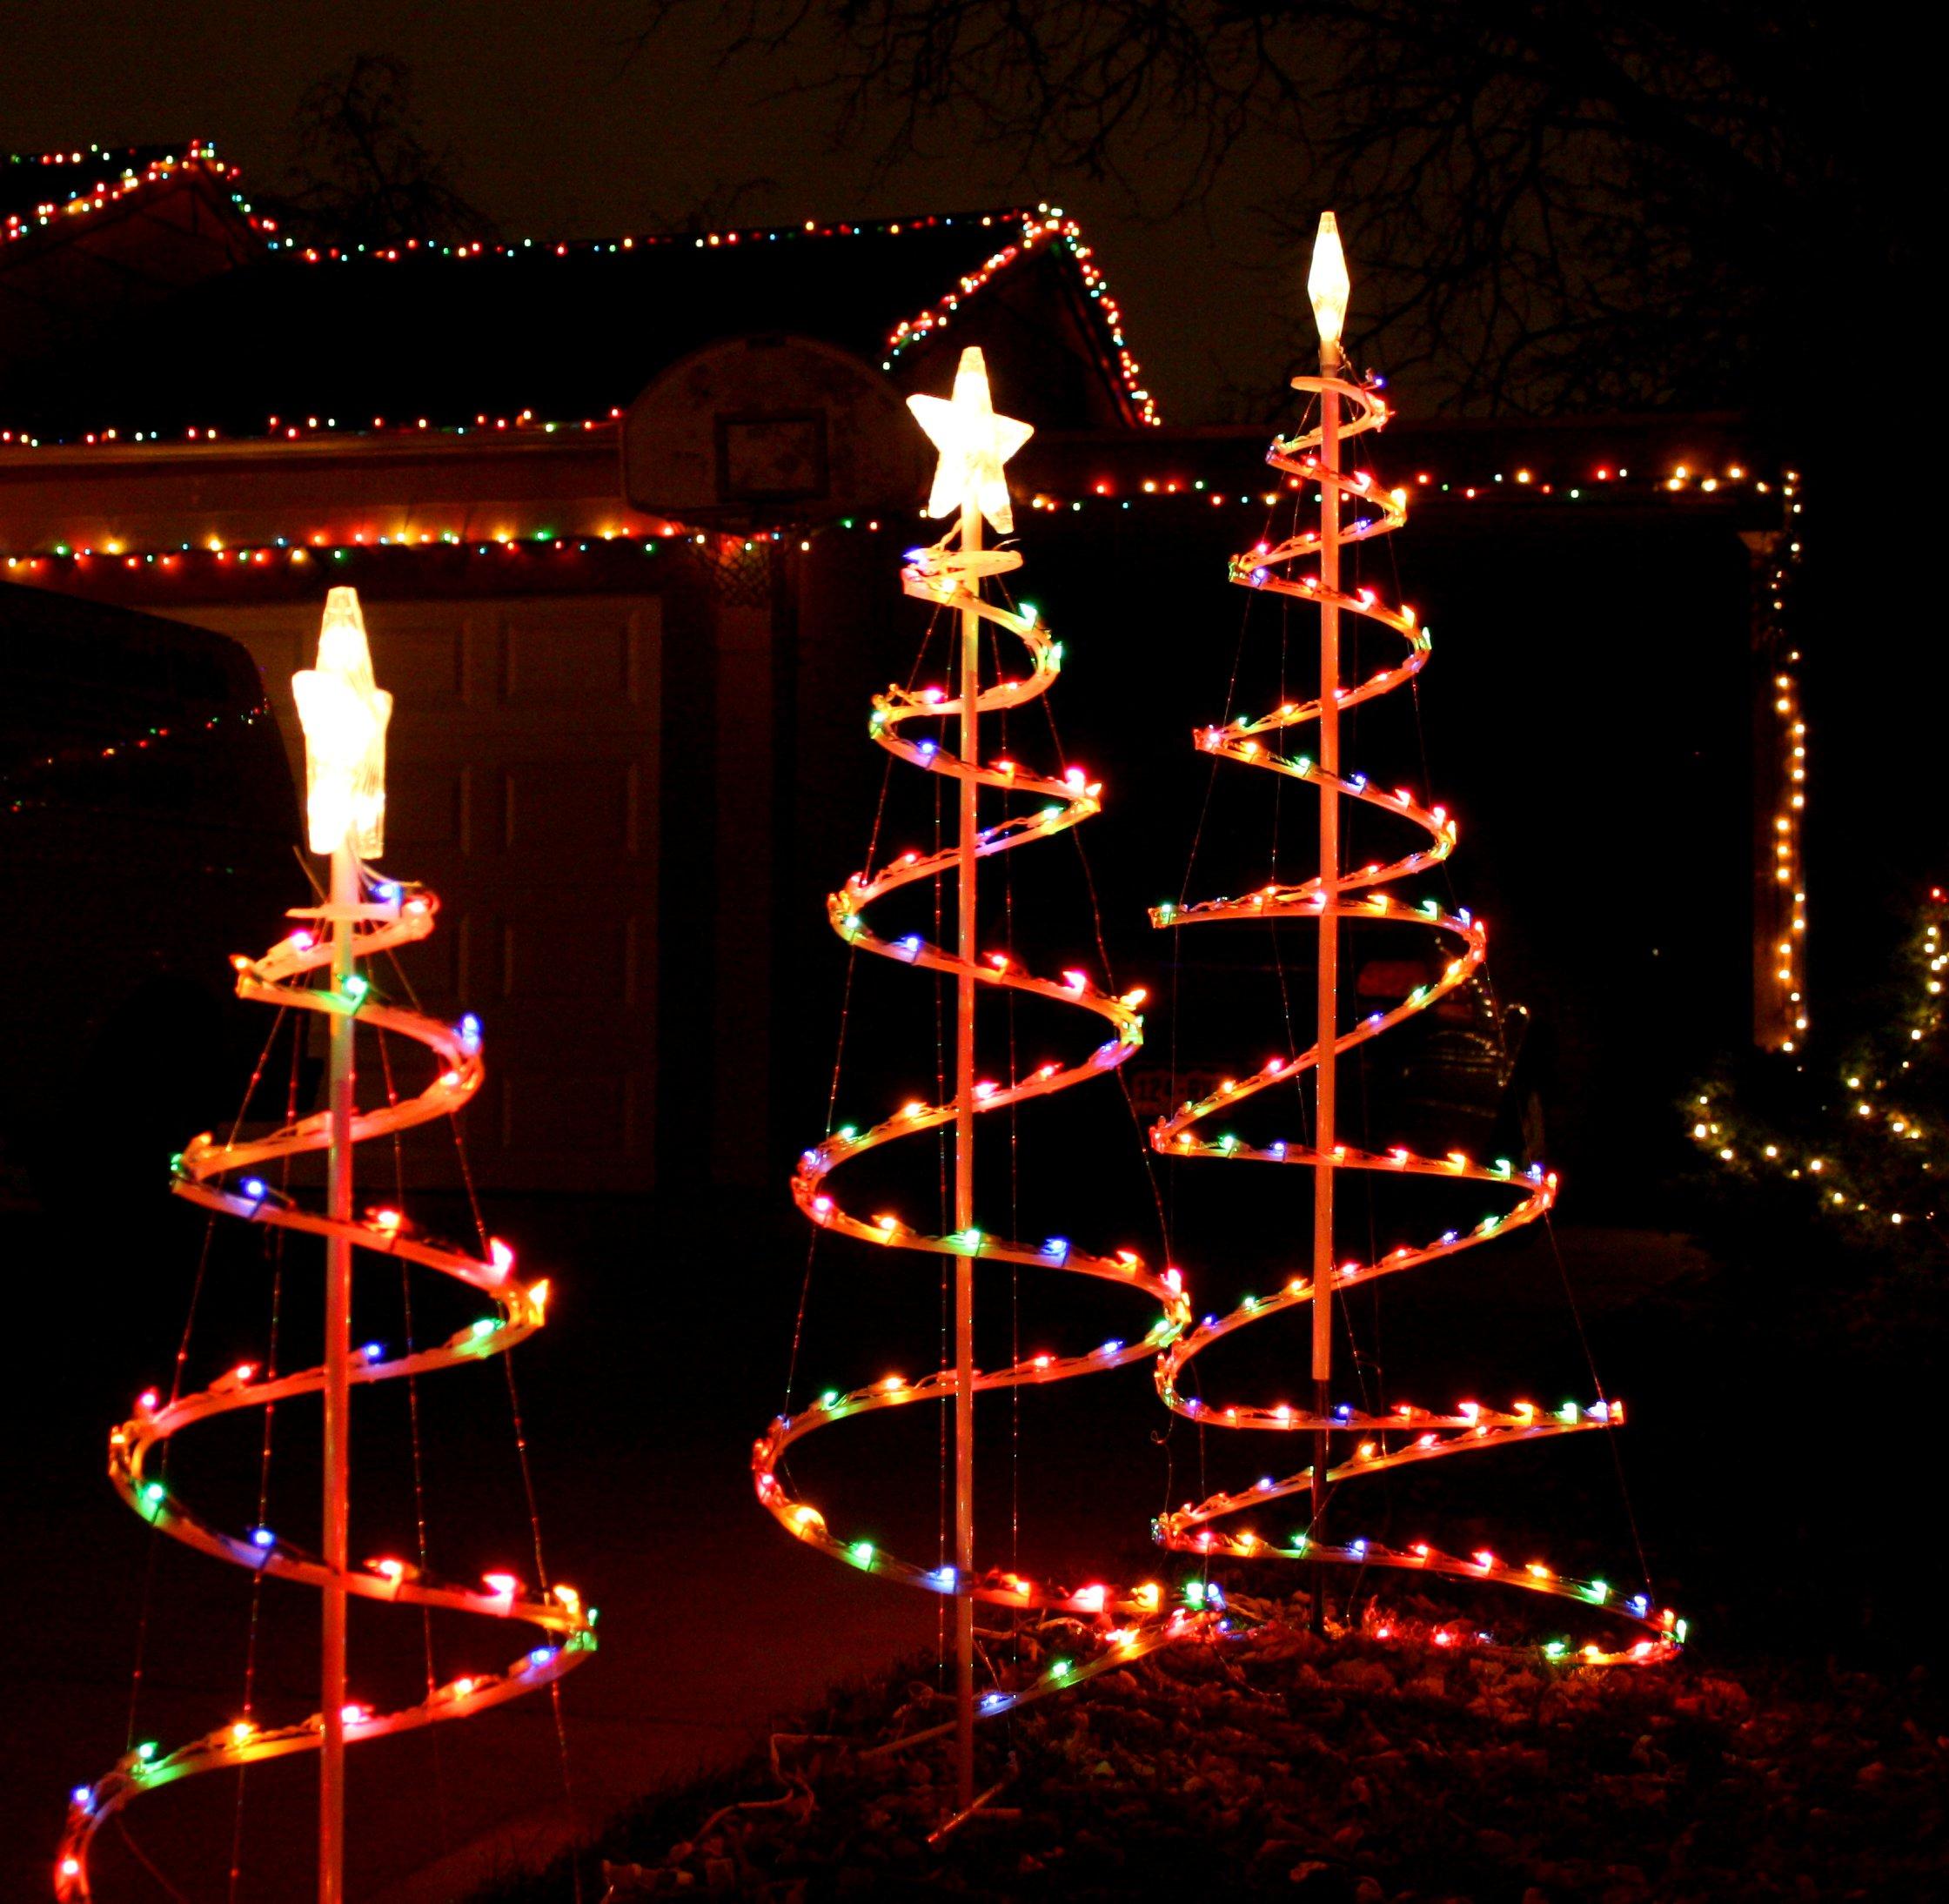 Three Spiral Christmas Trees